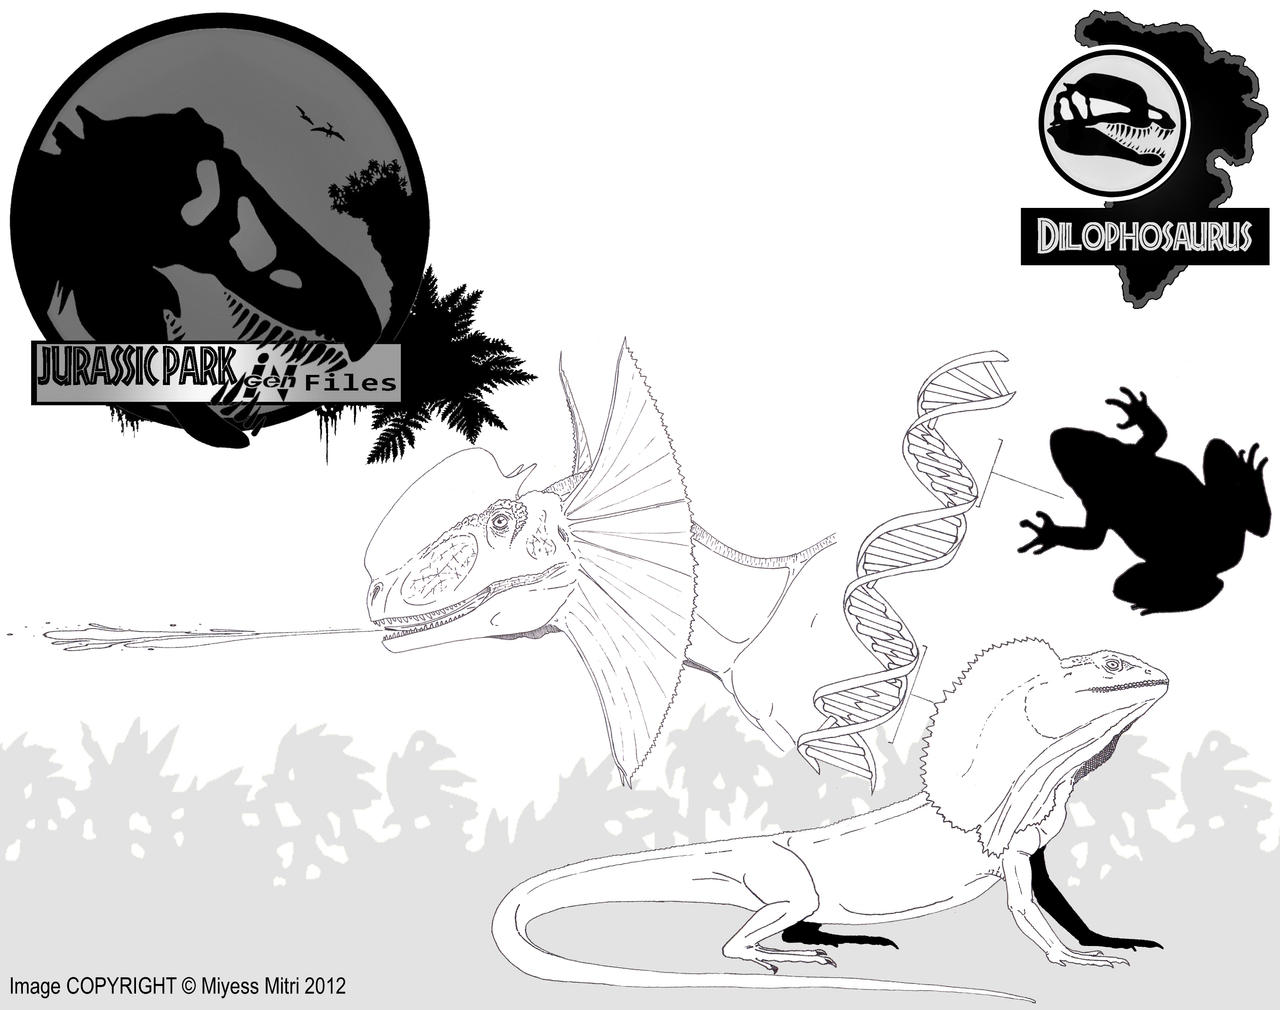 InGen Files Dilophosaurus Updated By Miyess